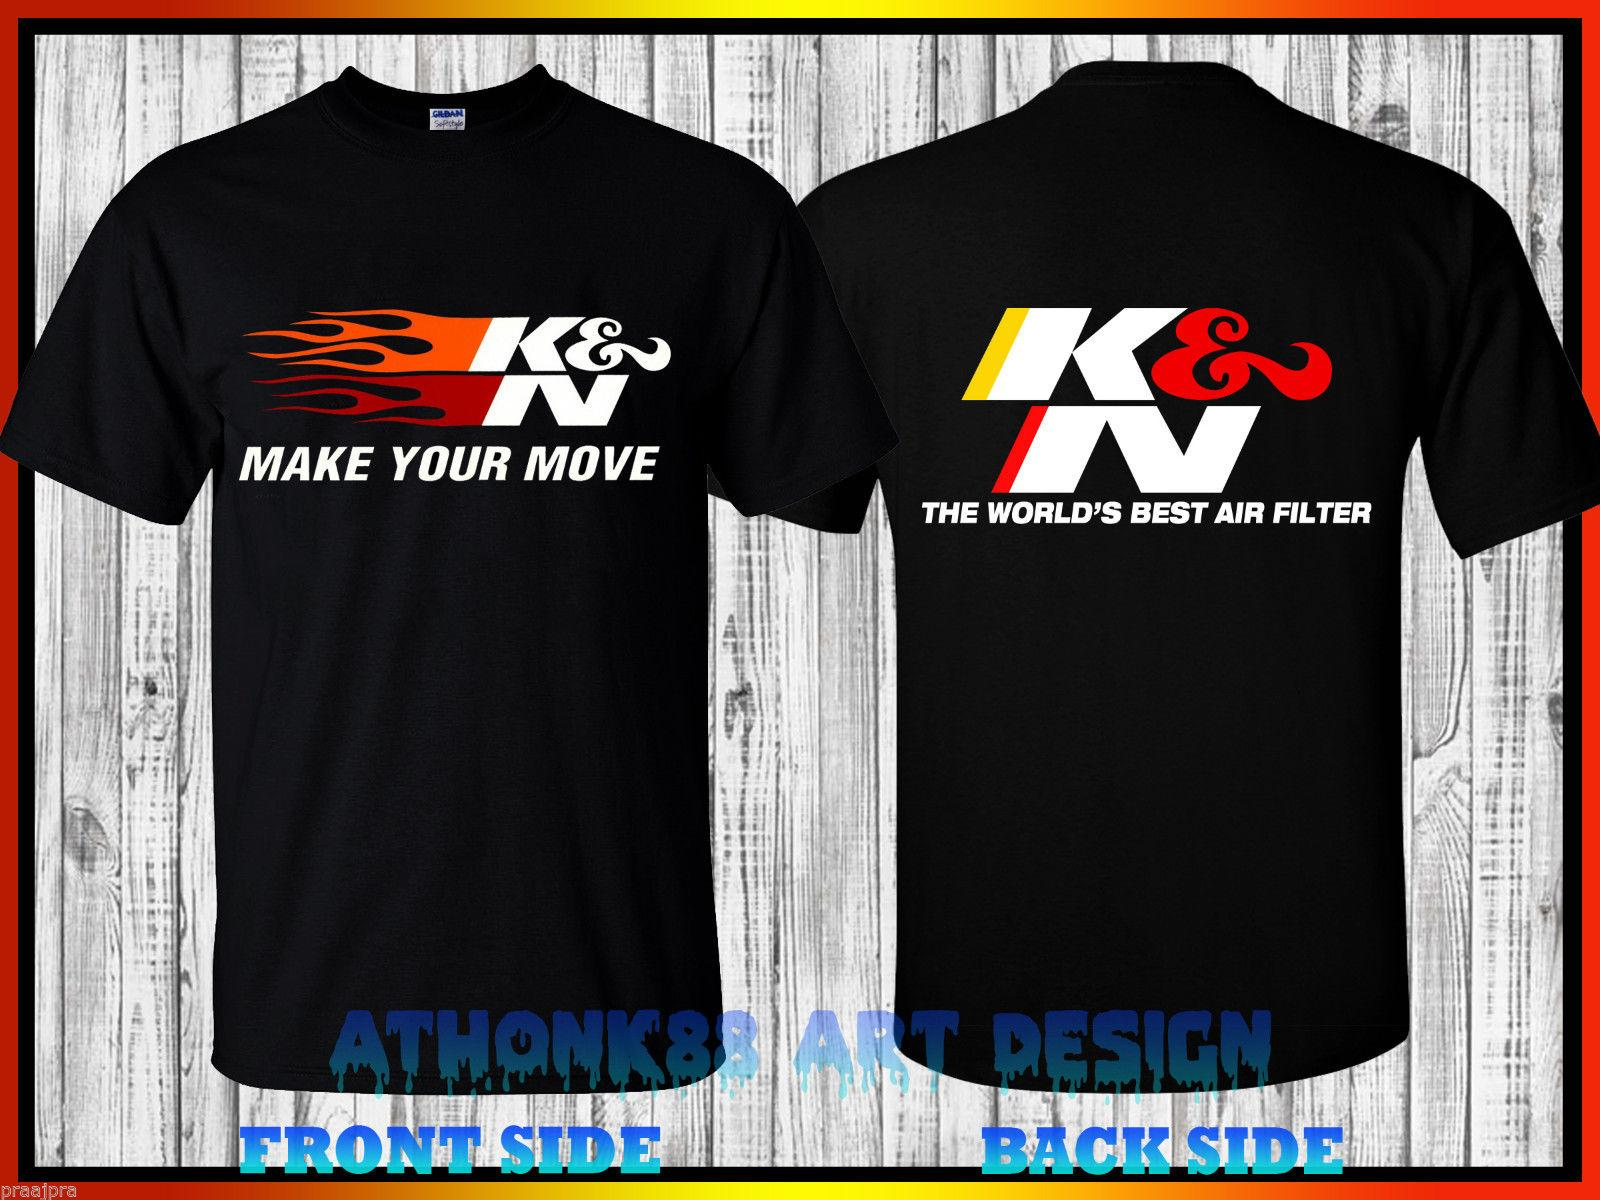 Racing T Shirt Design Ideas | K N Racing T Shirt K N Racing Air Filter T Shirt Funny Slogan T